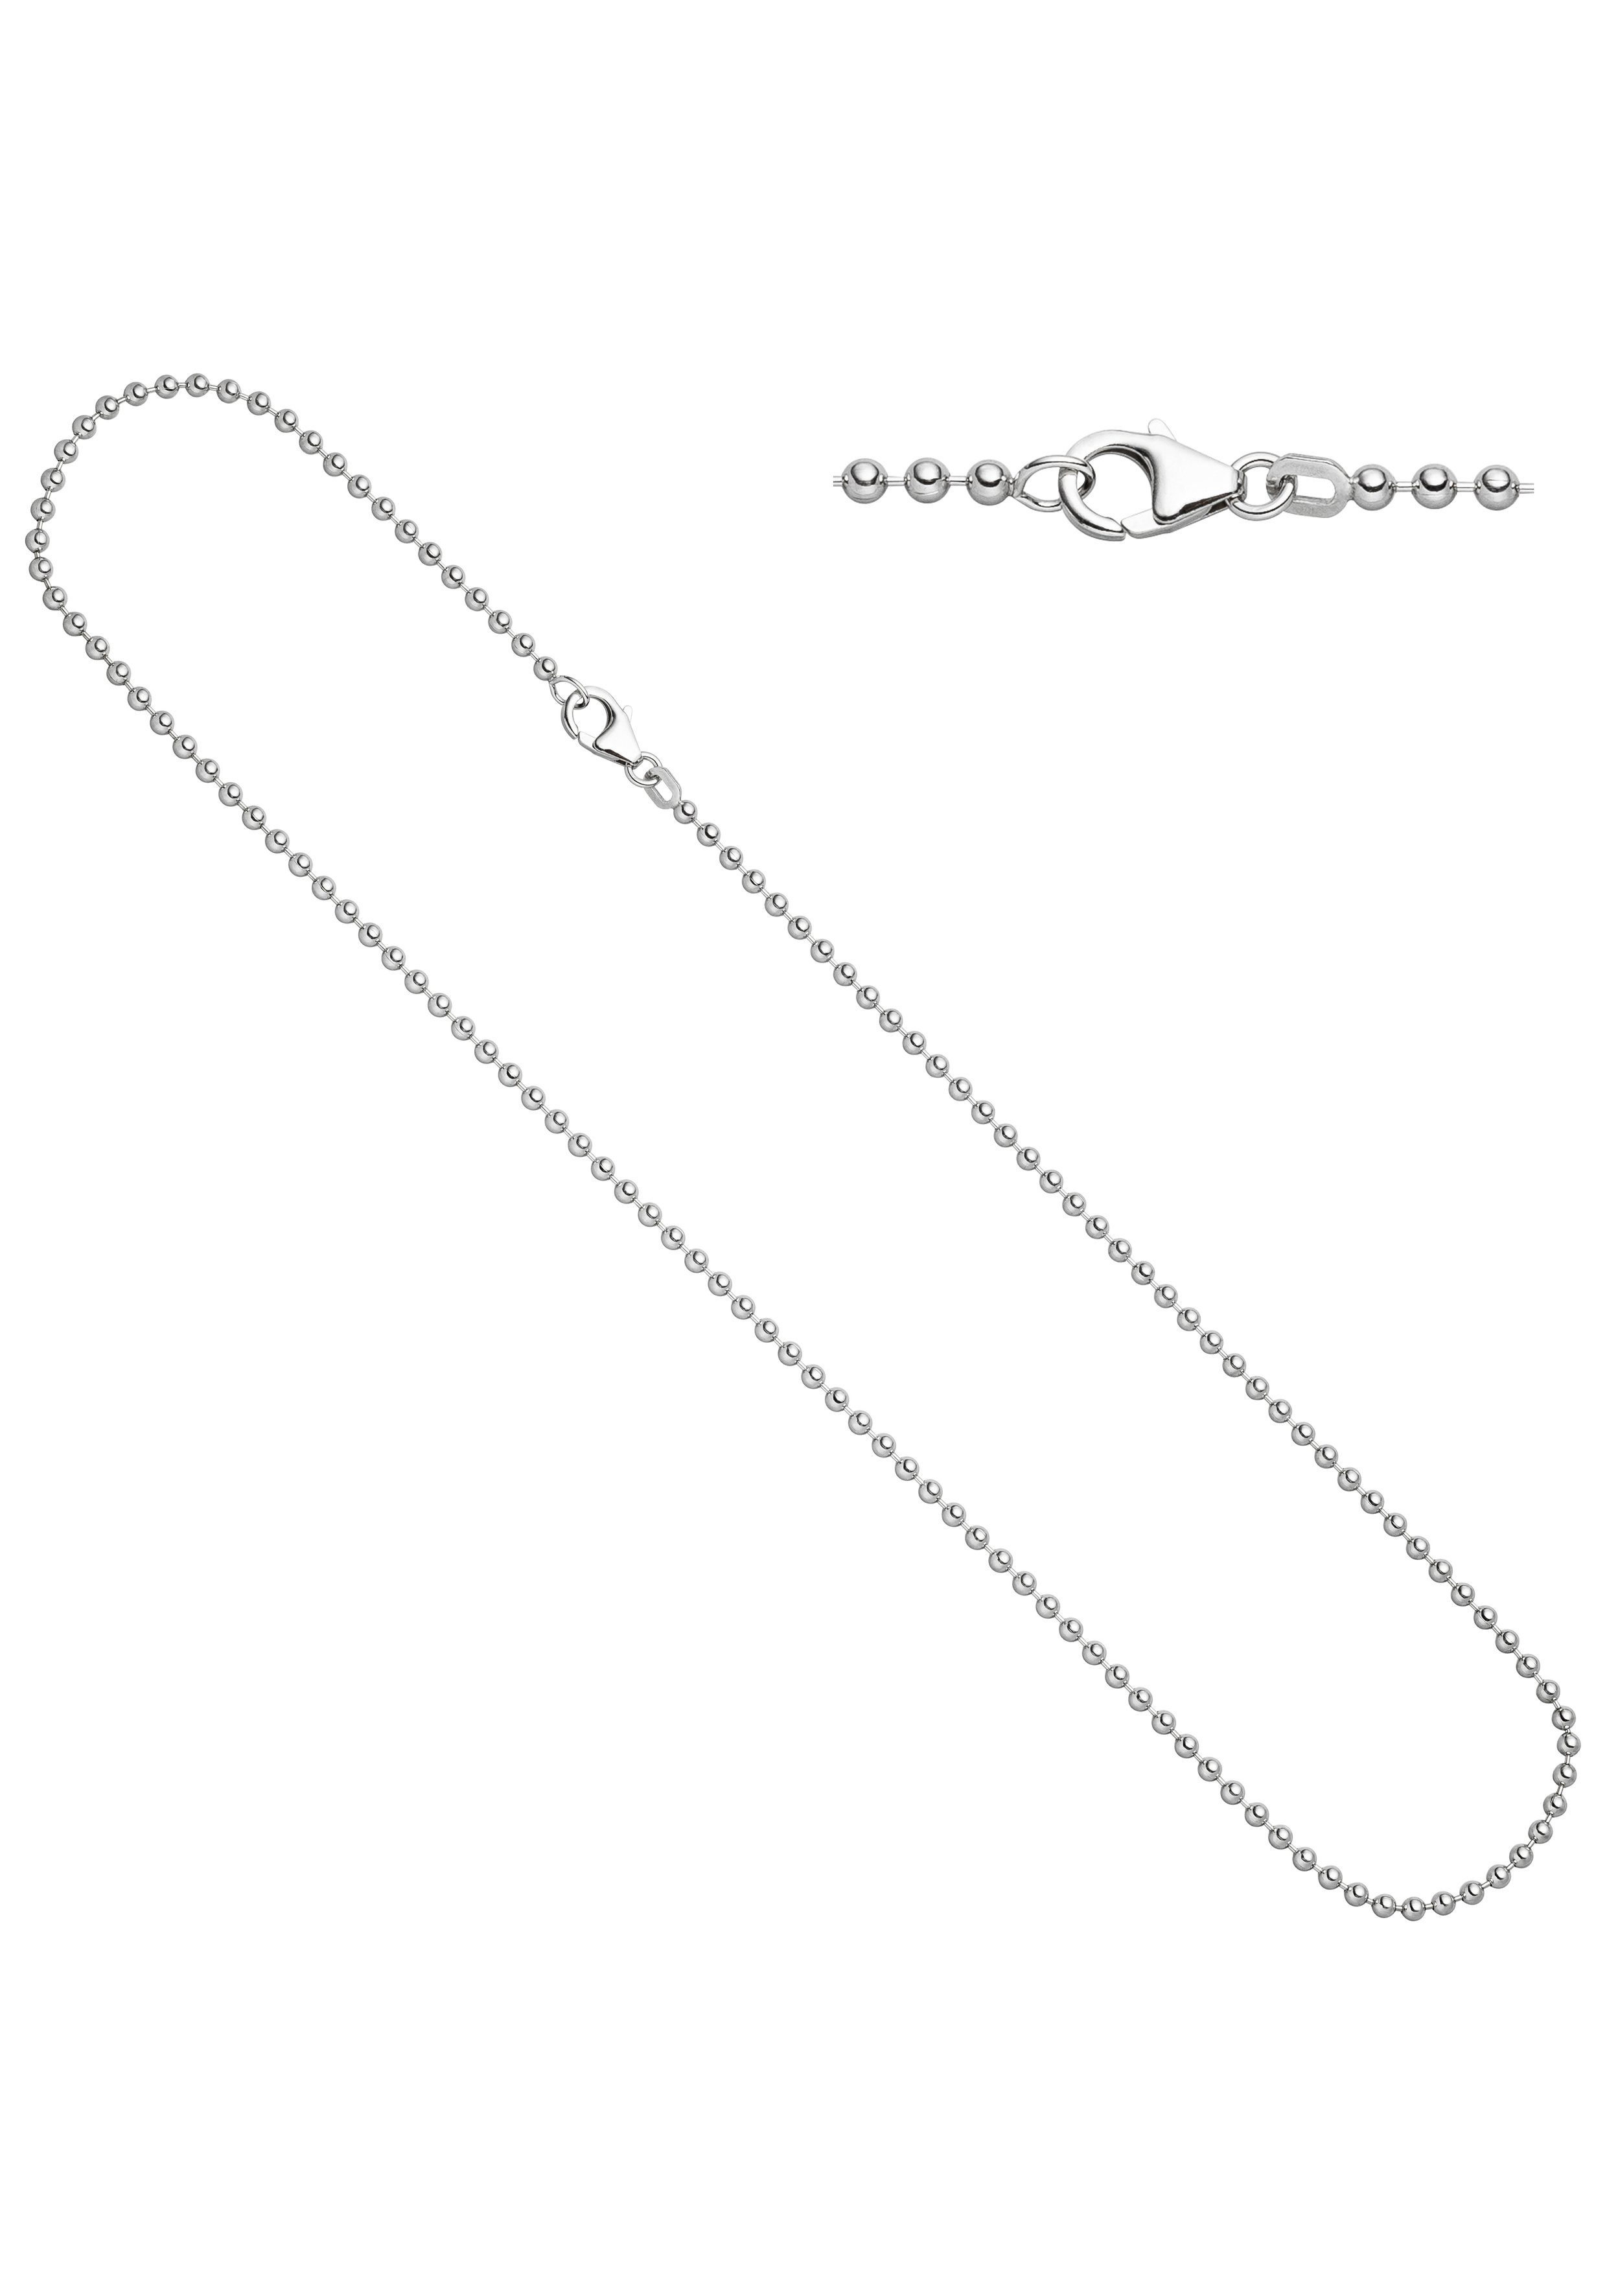 JOBO Silberkette Kugelkette 925 Silber 45 cm 2,5 mm